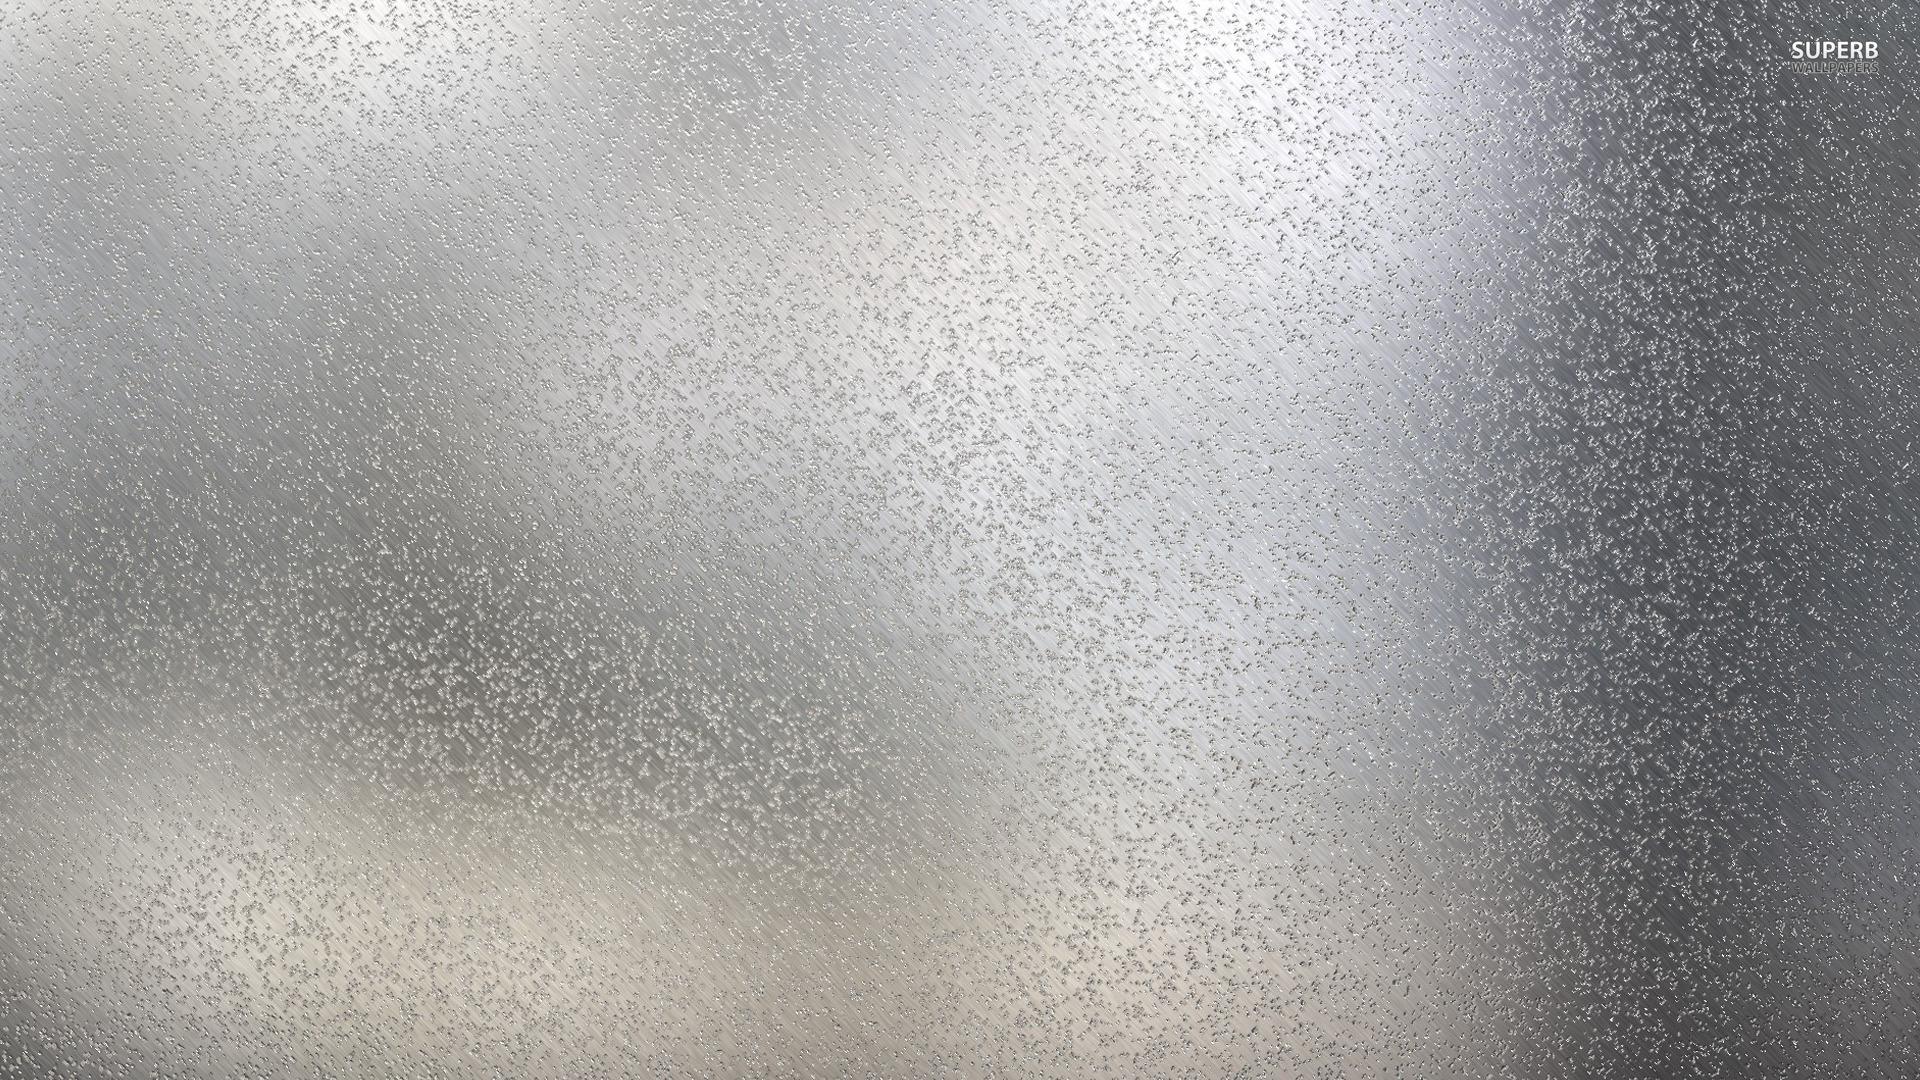 Vintage Car Wallpaper Transparent Glass Wallpaper 1920x1080 8647